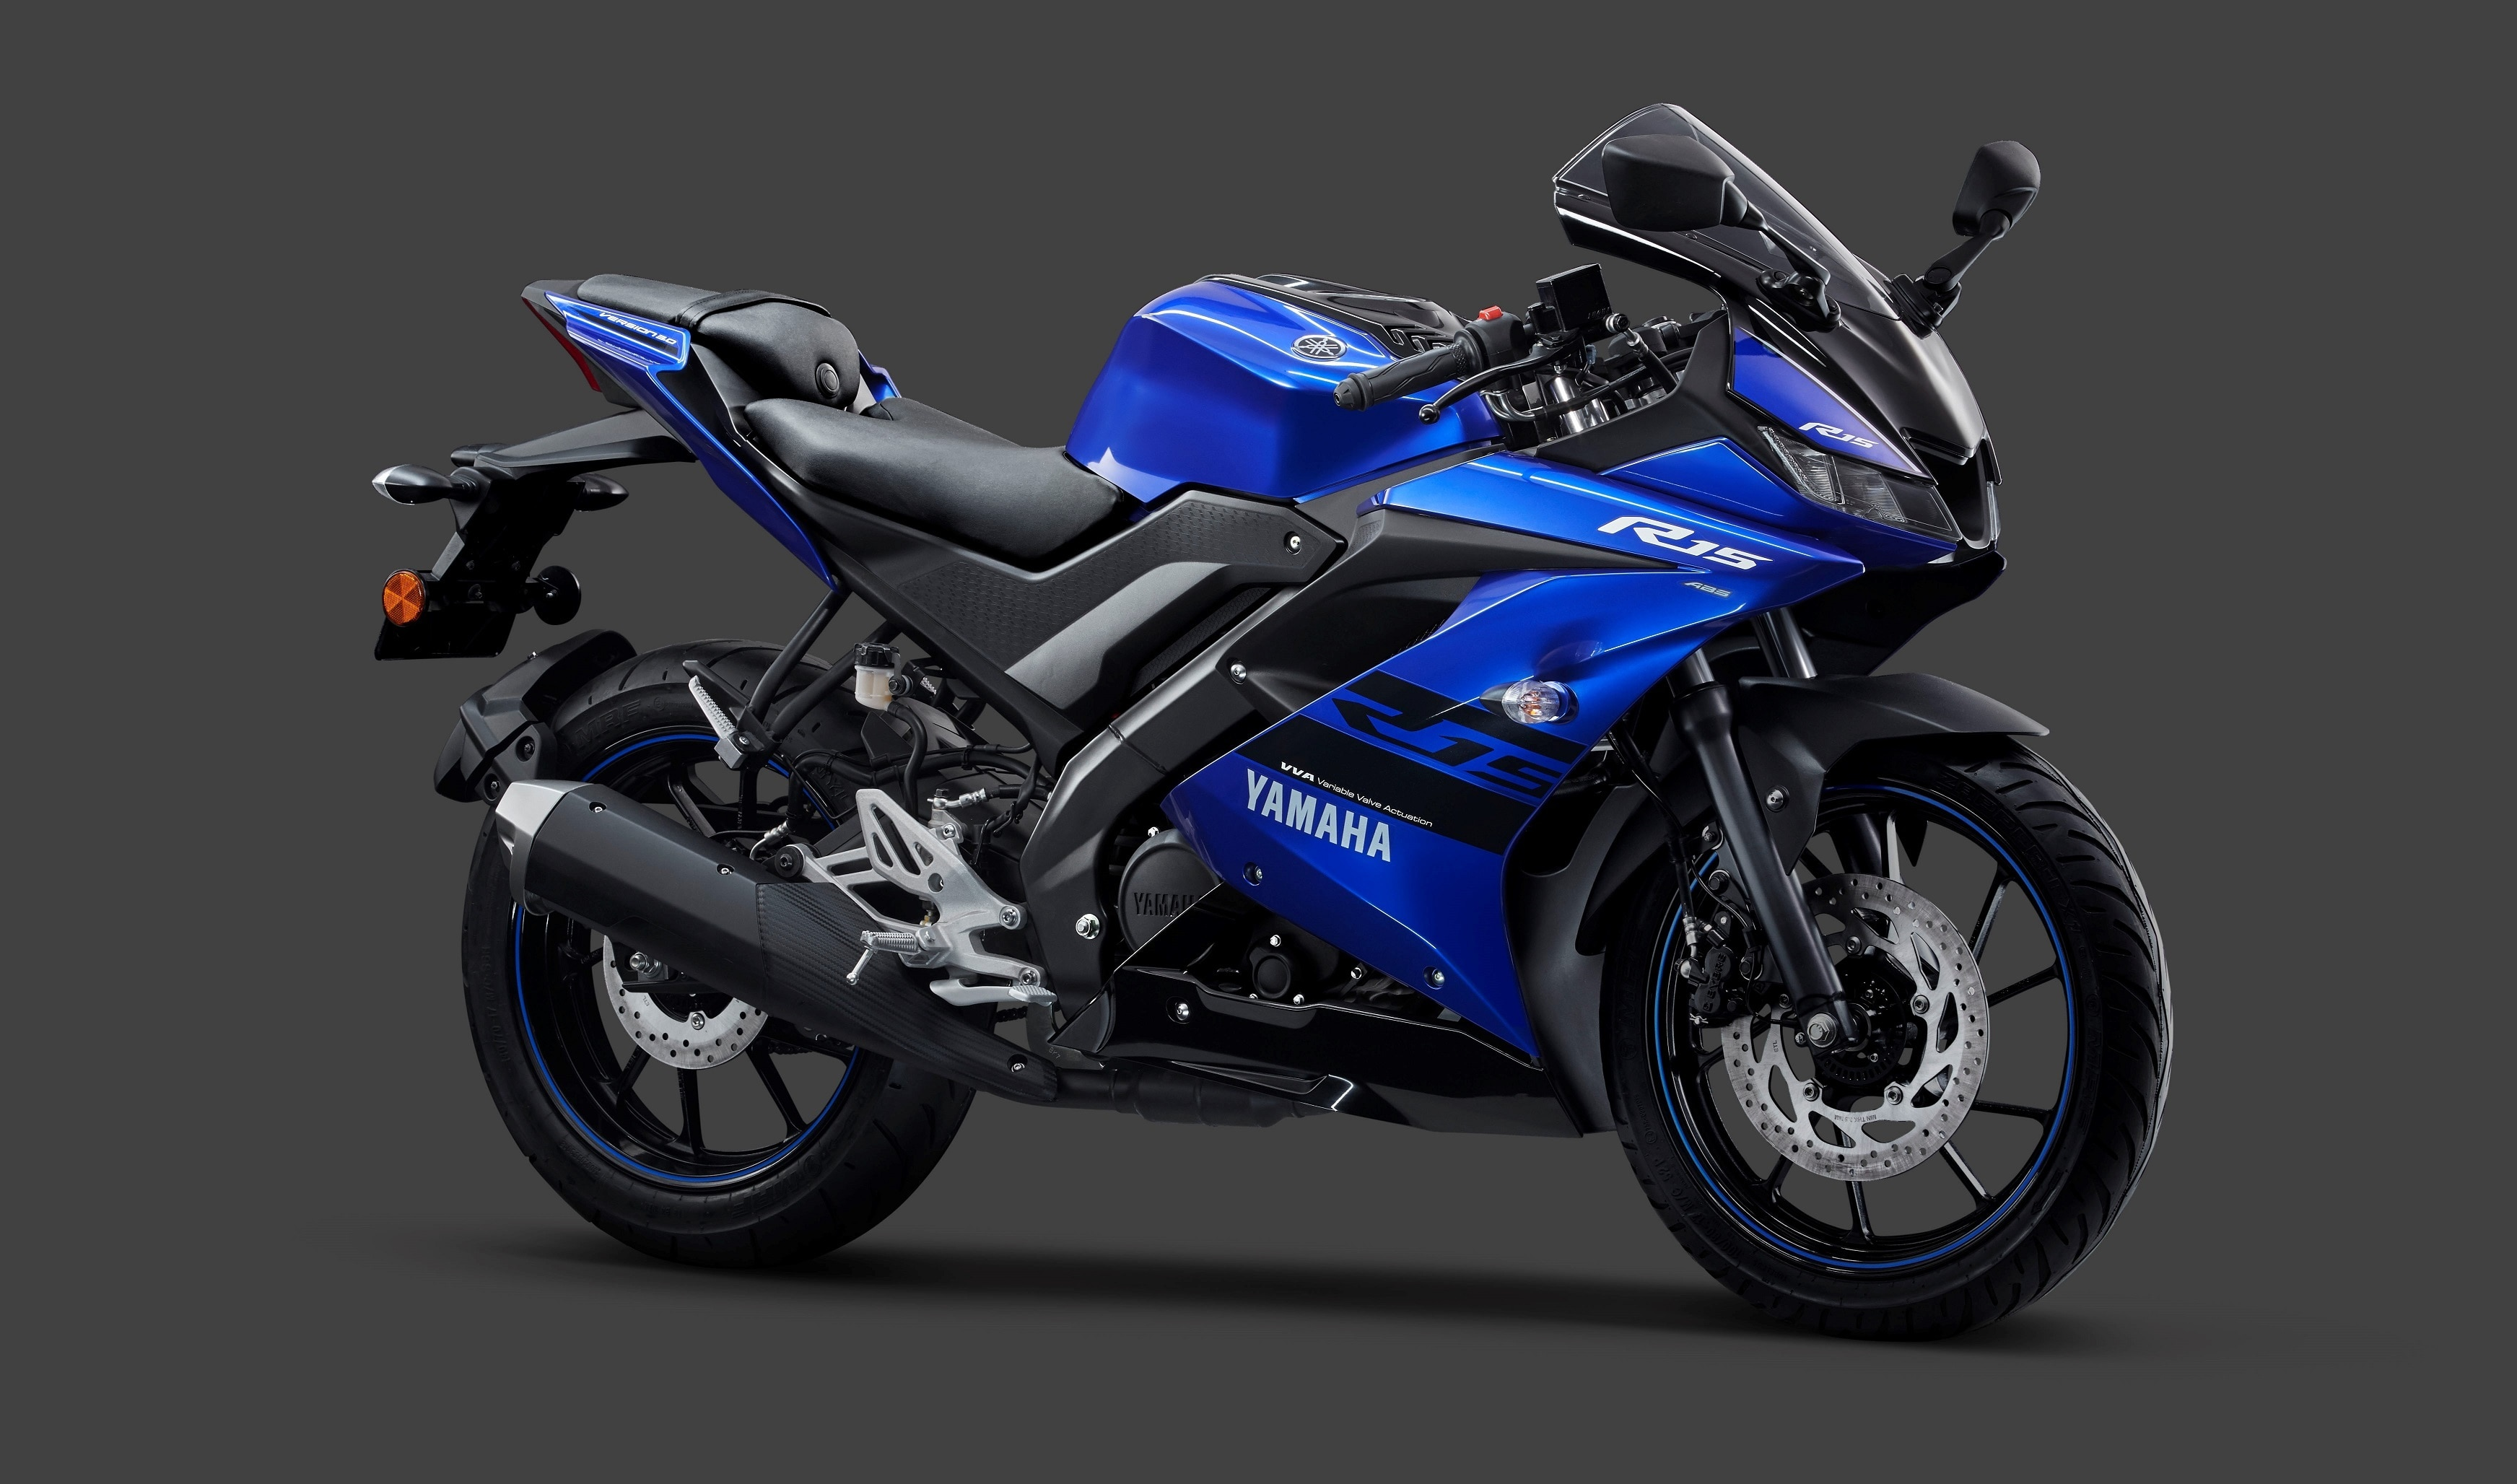 Yamaha YZF-R15 V3 ABS Launched   BikeDekho